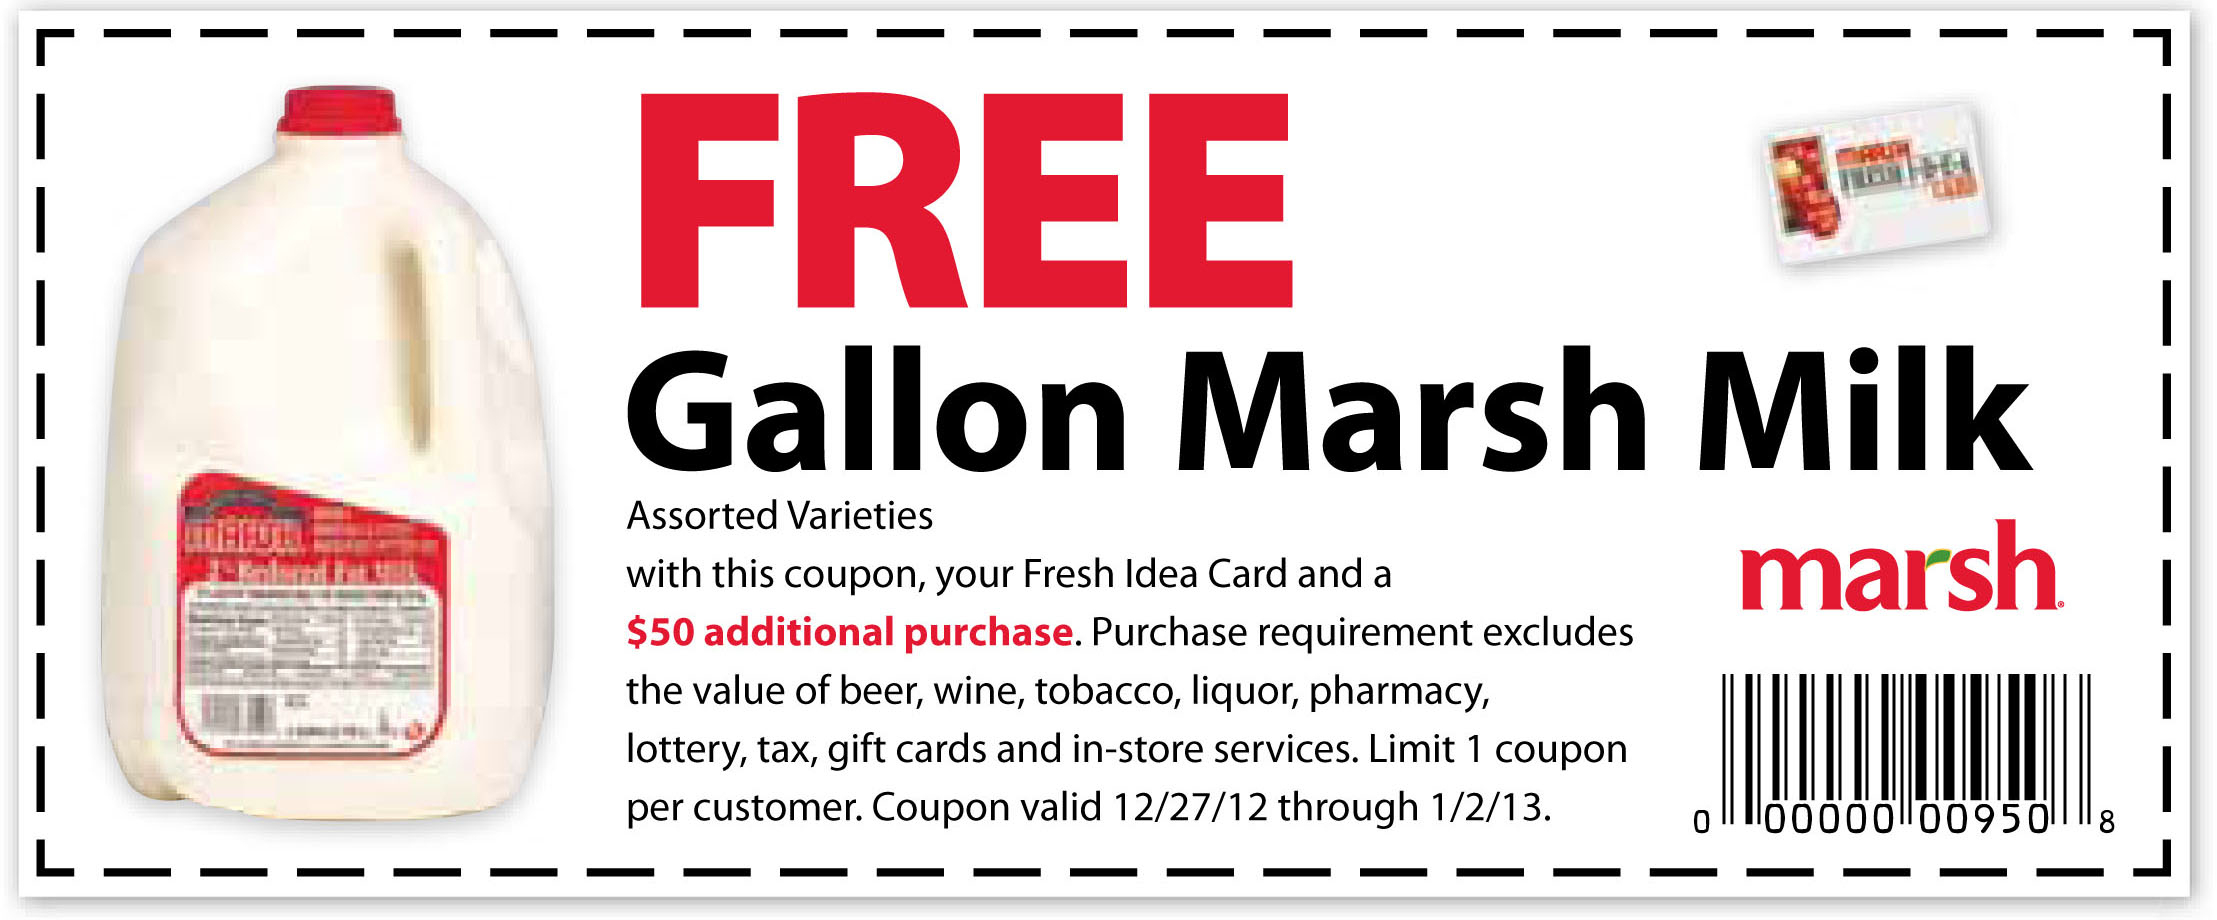 Printable Beer Vouchers   Download Them Or Print - Free Printable Beer Coupons